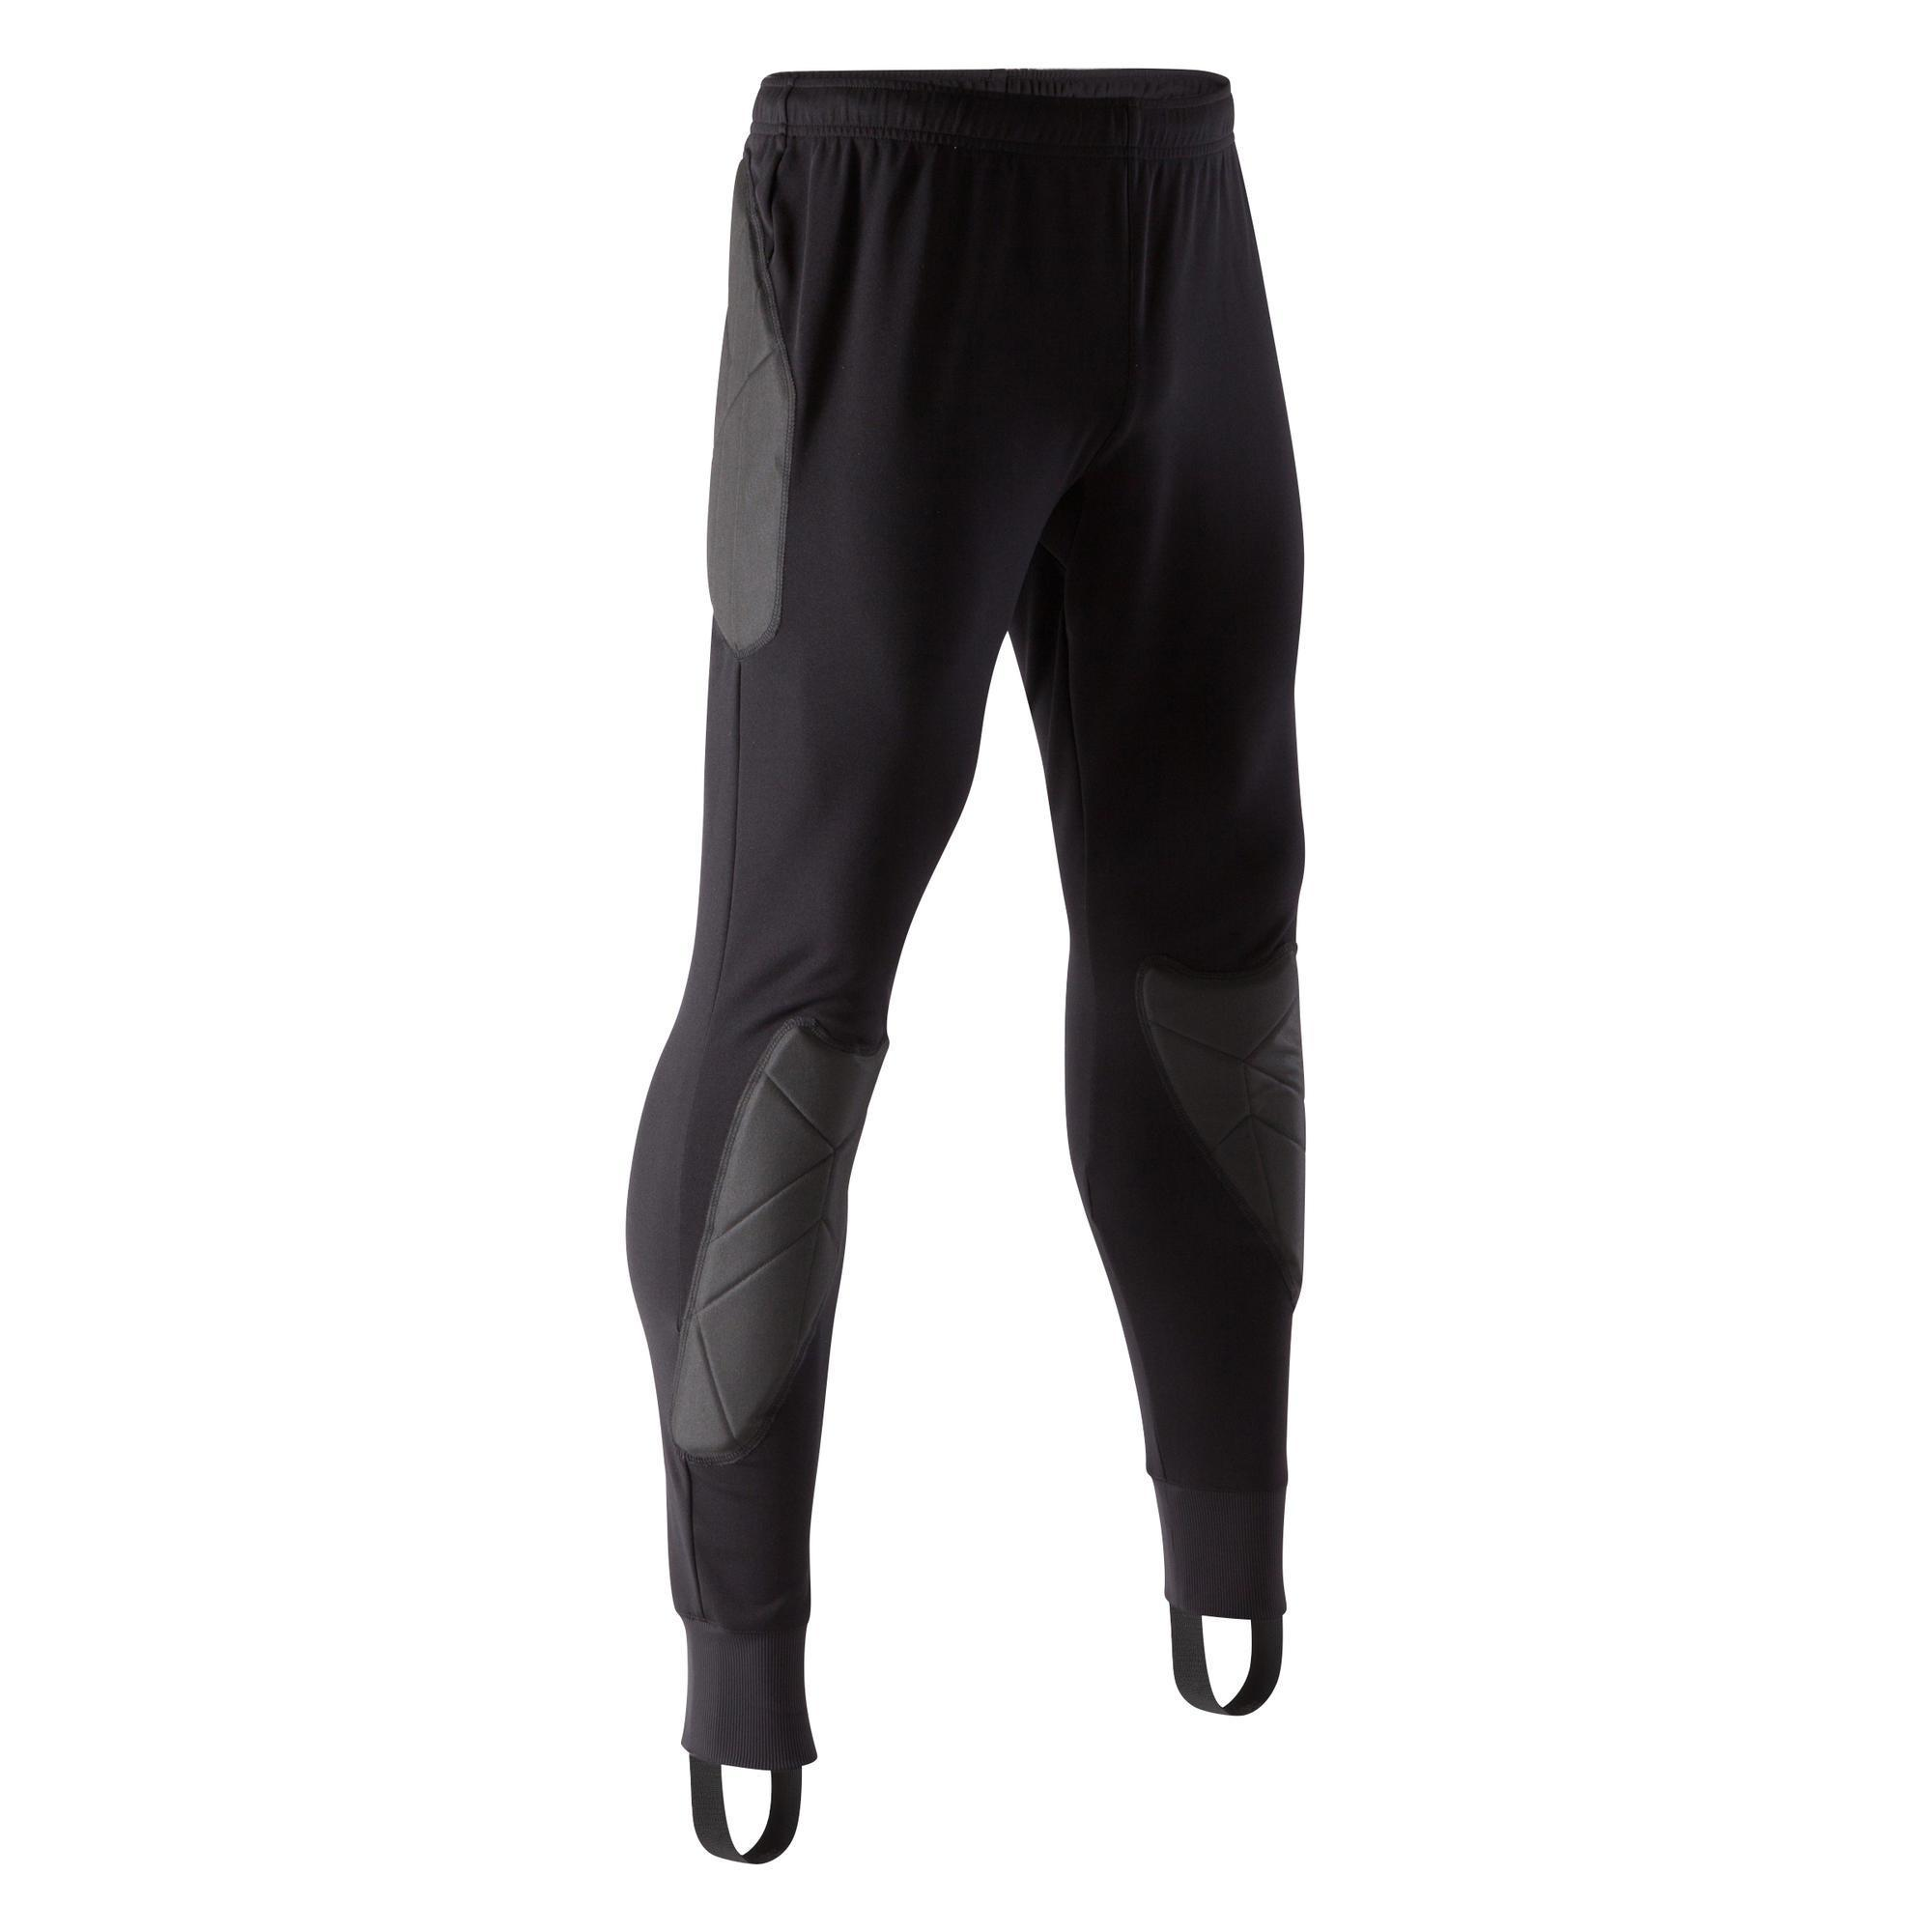 Torwarthose lang F100 Erwachsene schwarz   Sportbekleidung > Sporthosen > Fahrradhosen   Kipsta